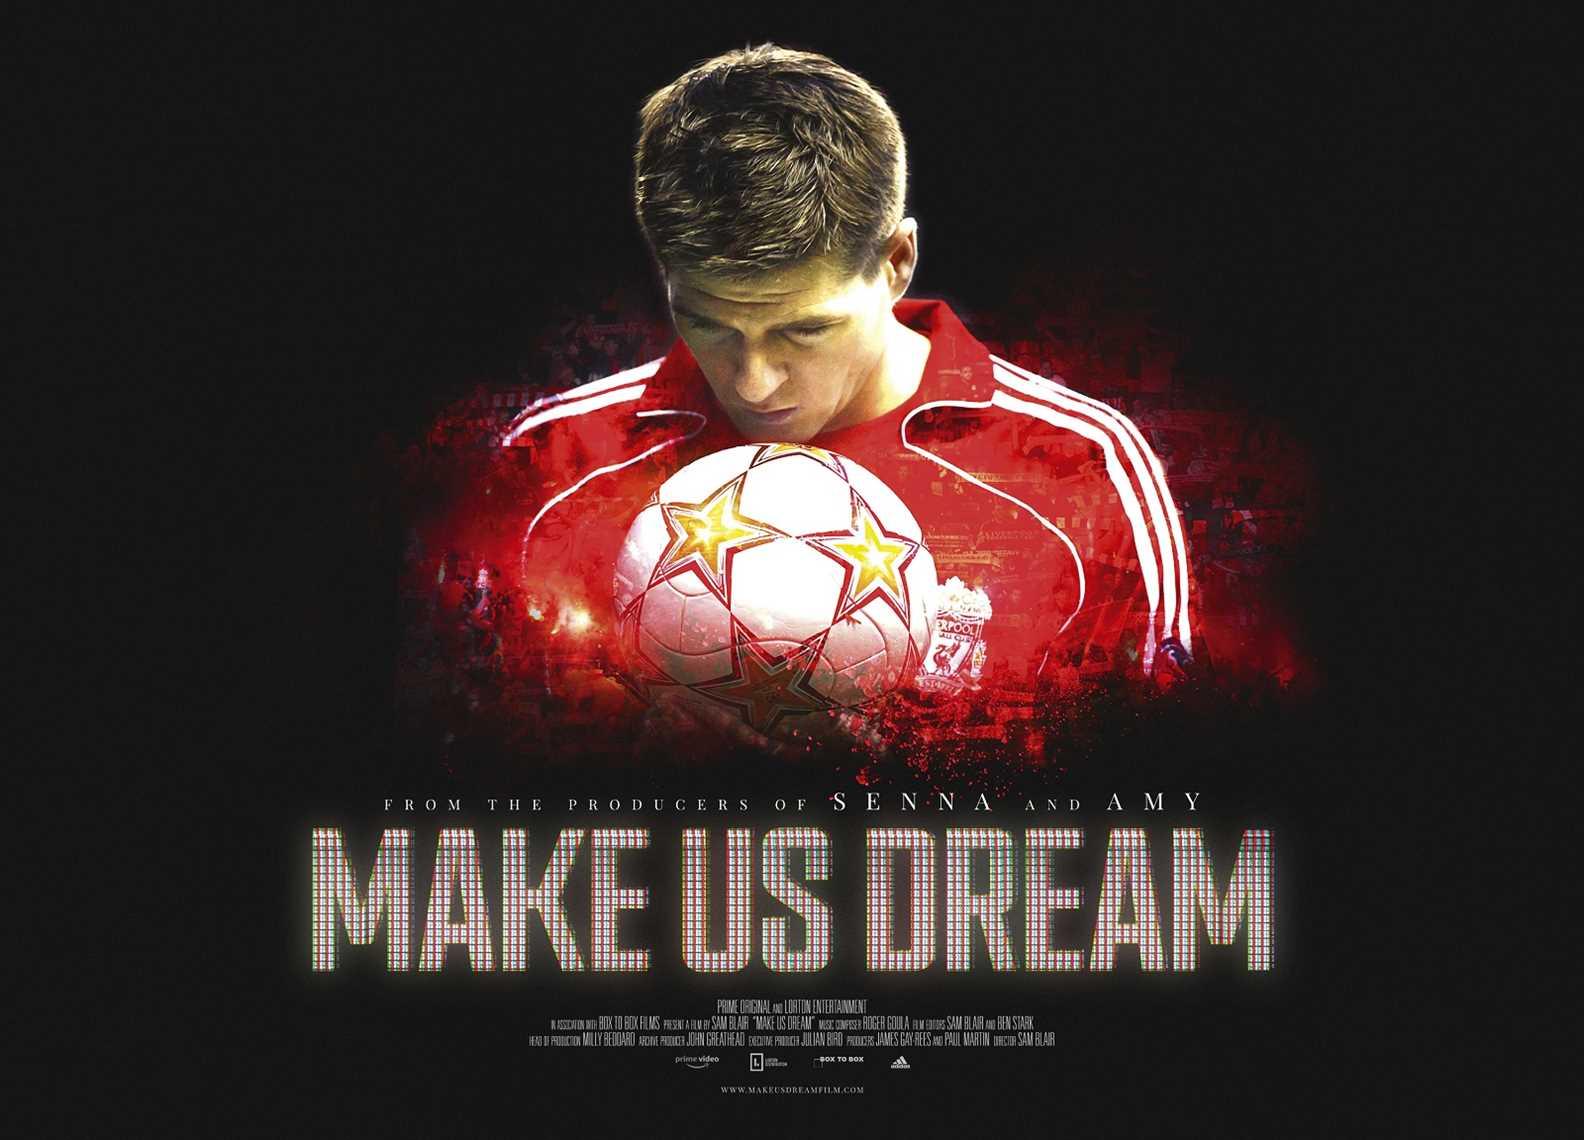 watch make us dream live satellite intro with steven gerrard at